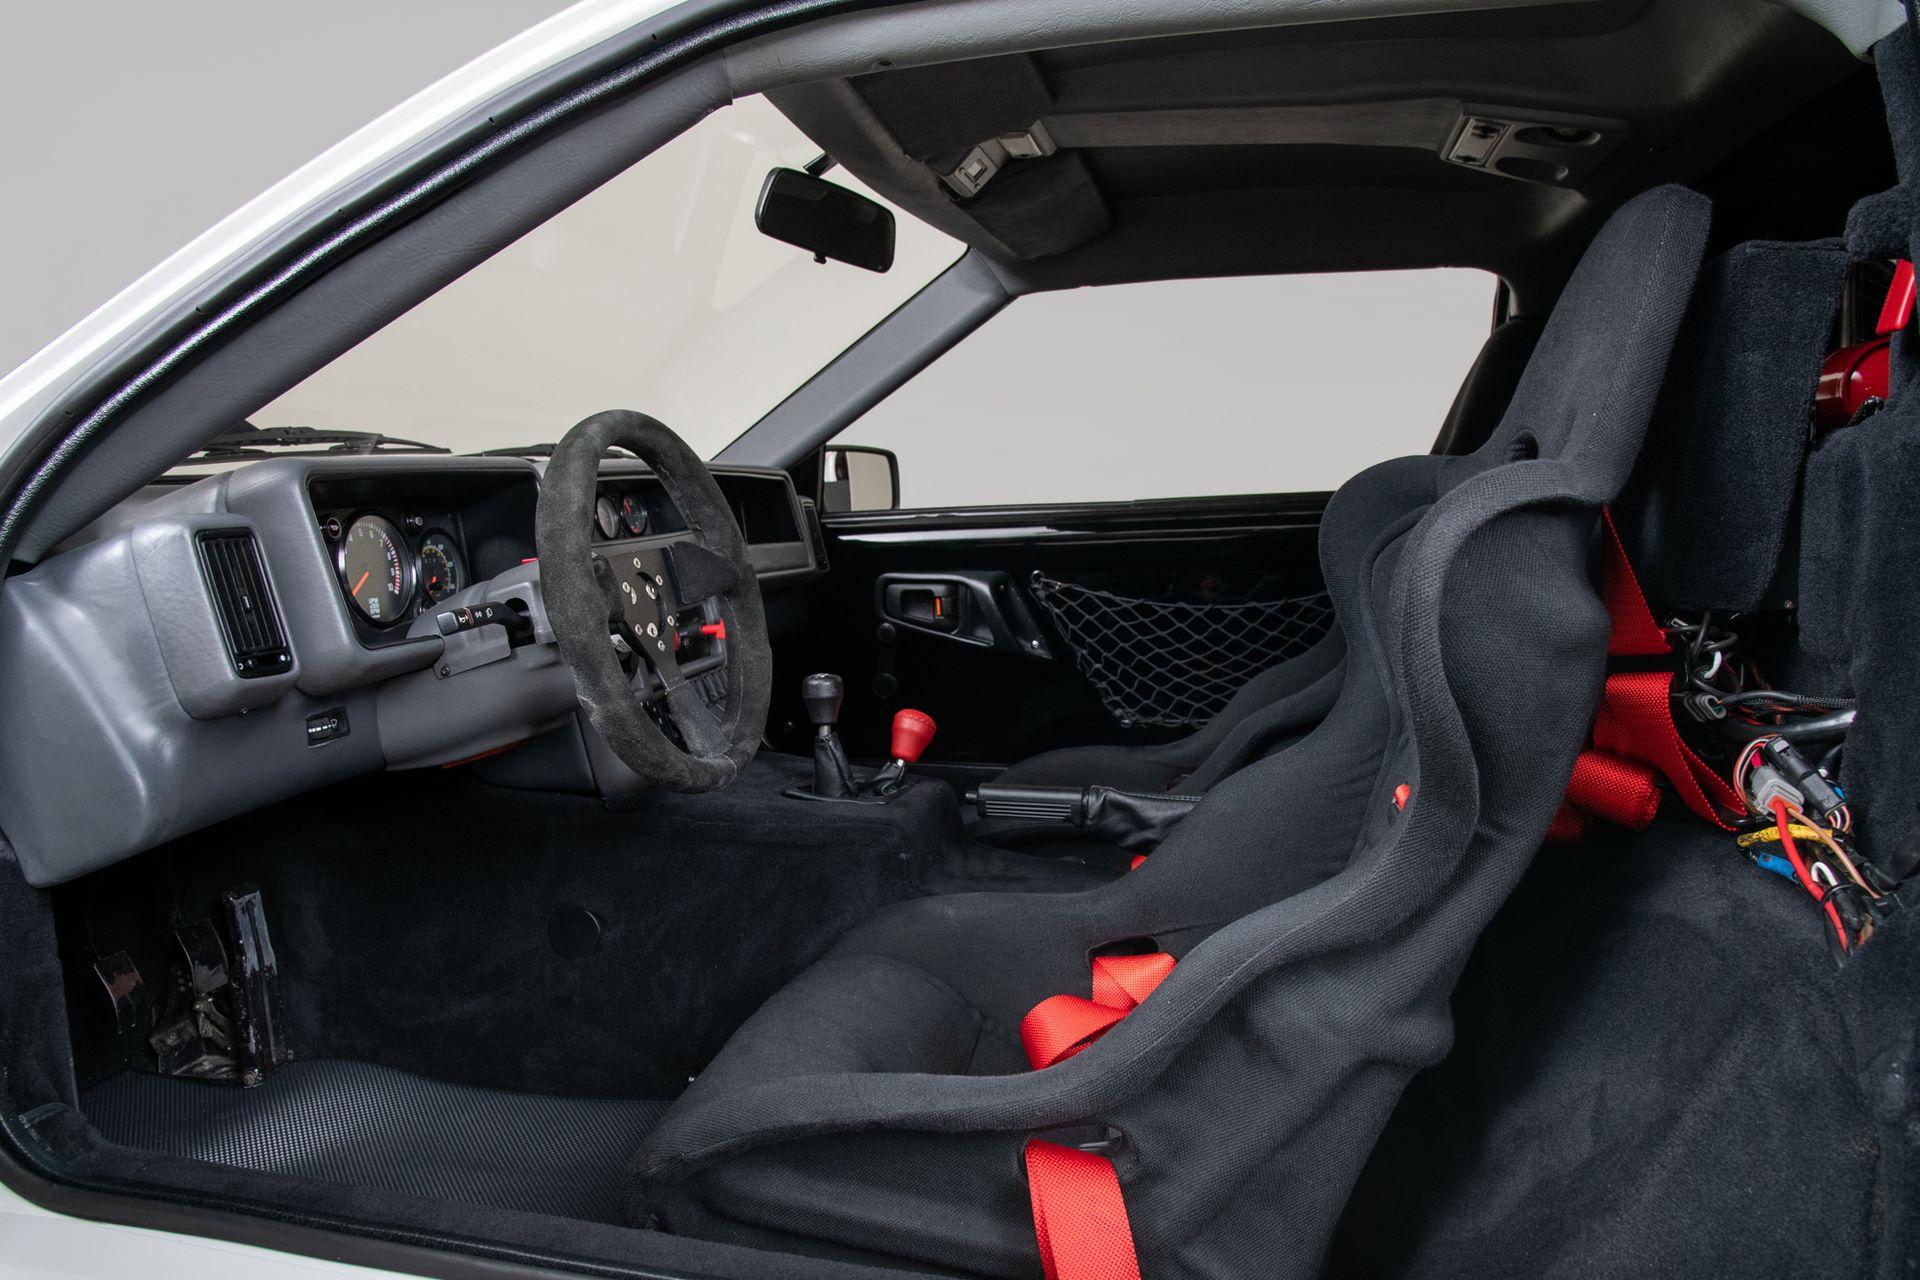 Ford-RS200-Evolution-Evo-for-sale-18